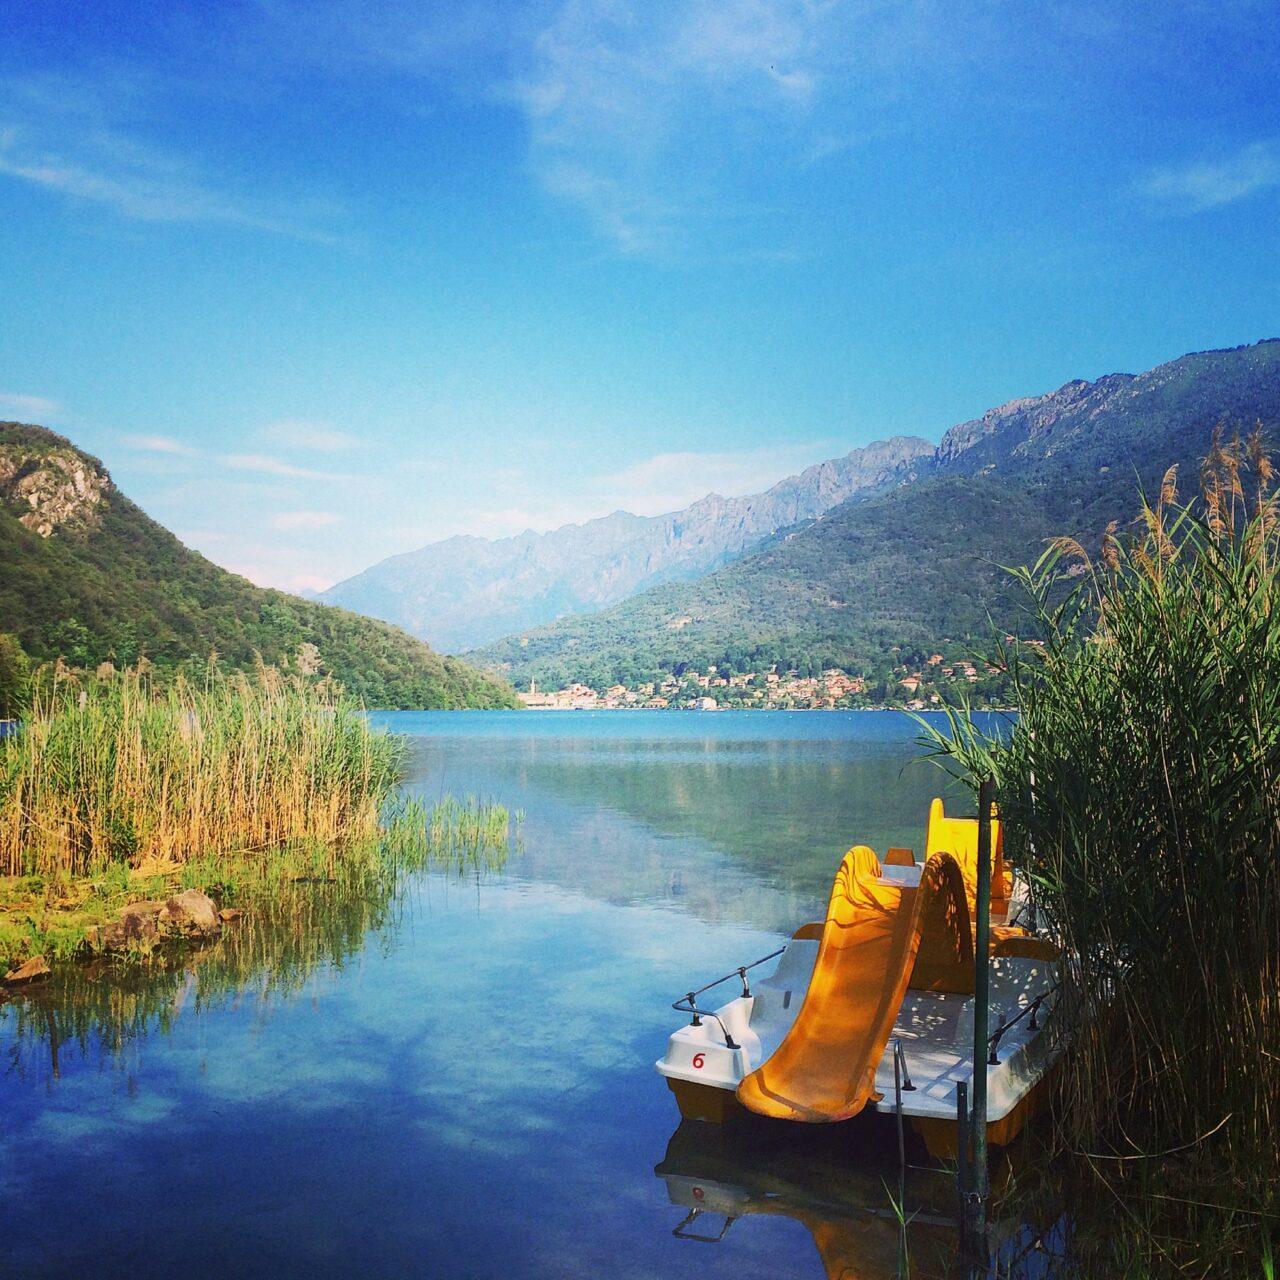 Badestelle am Lago Mergozzo